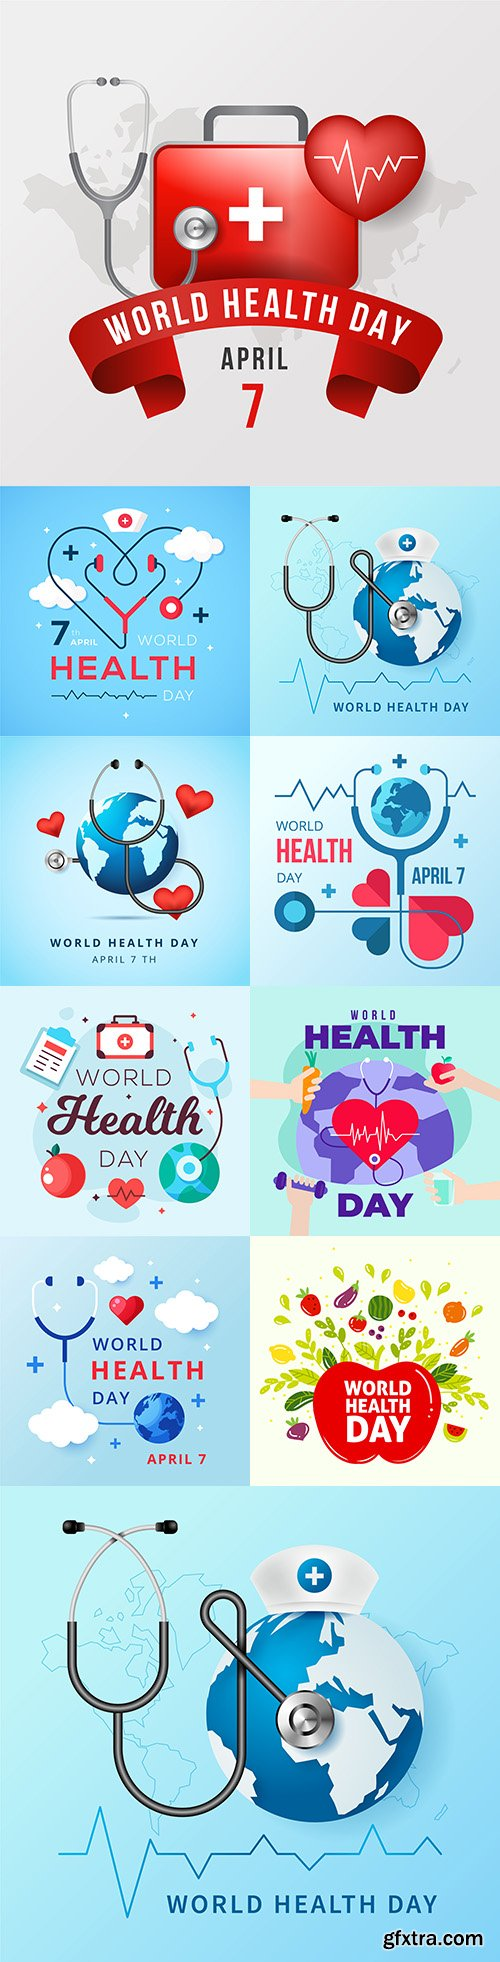 World Health Day flat design illustration 2